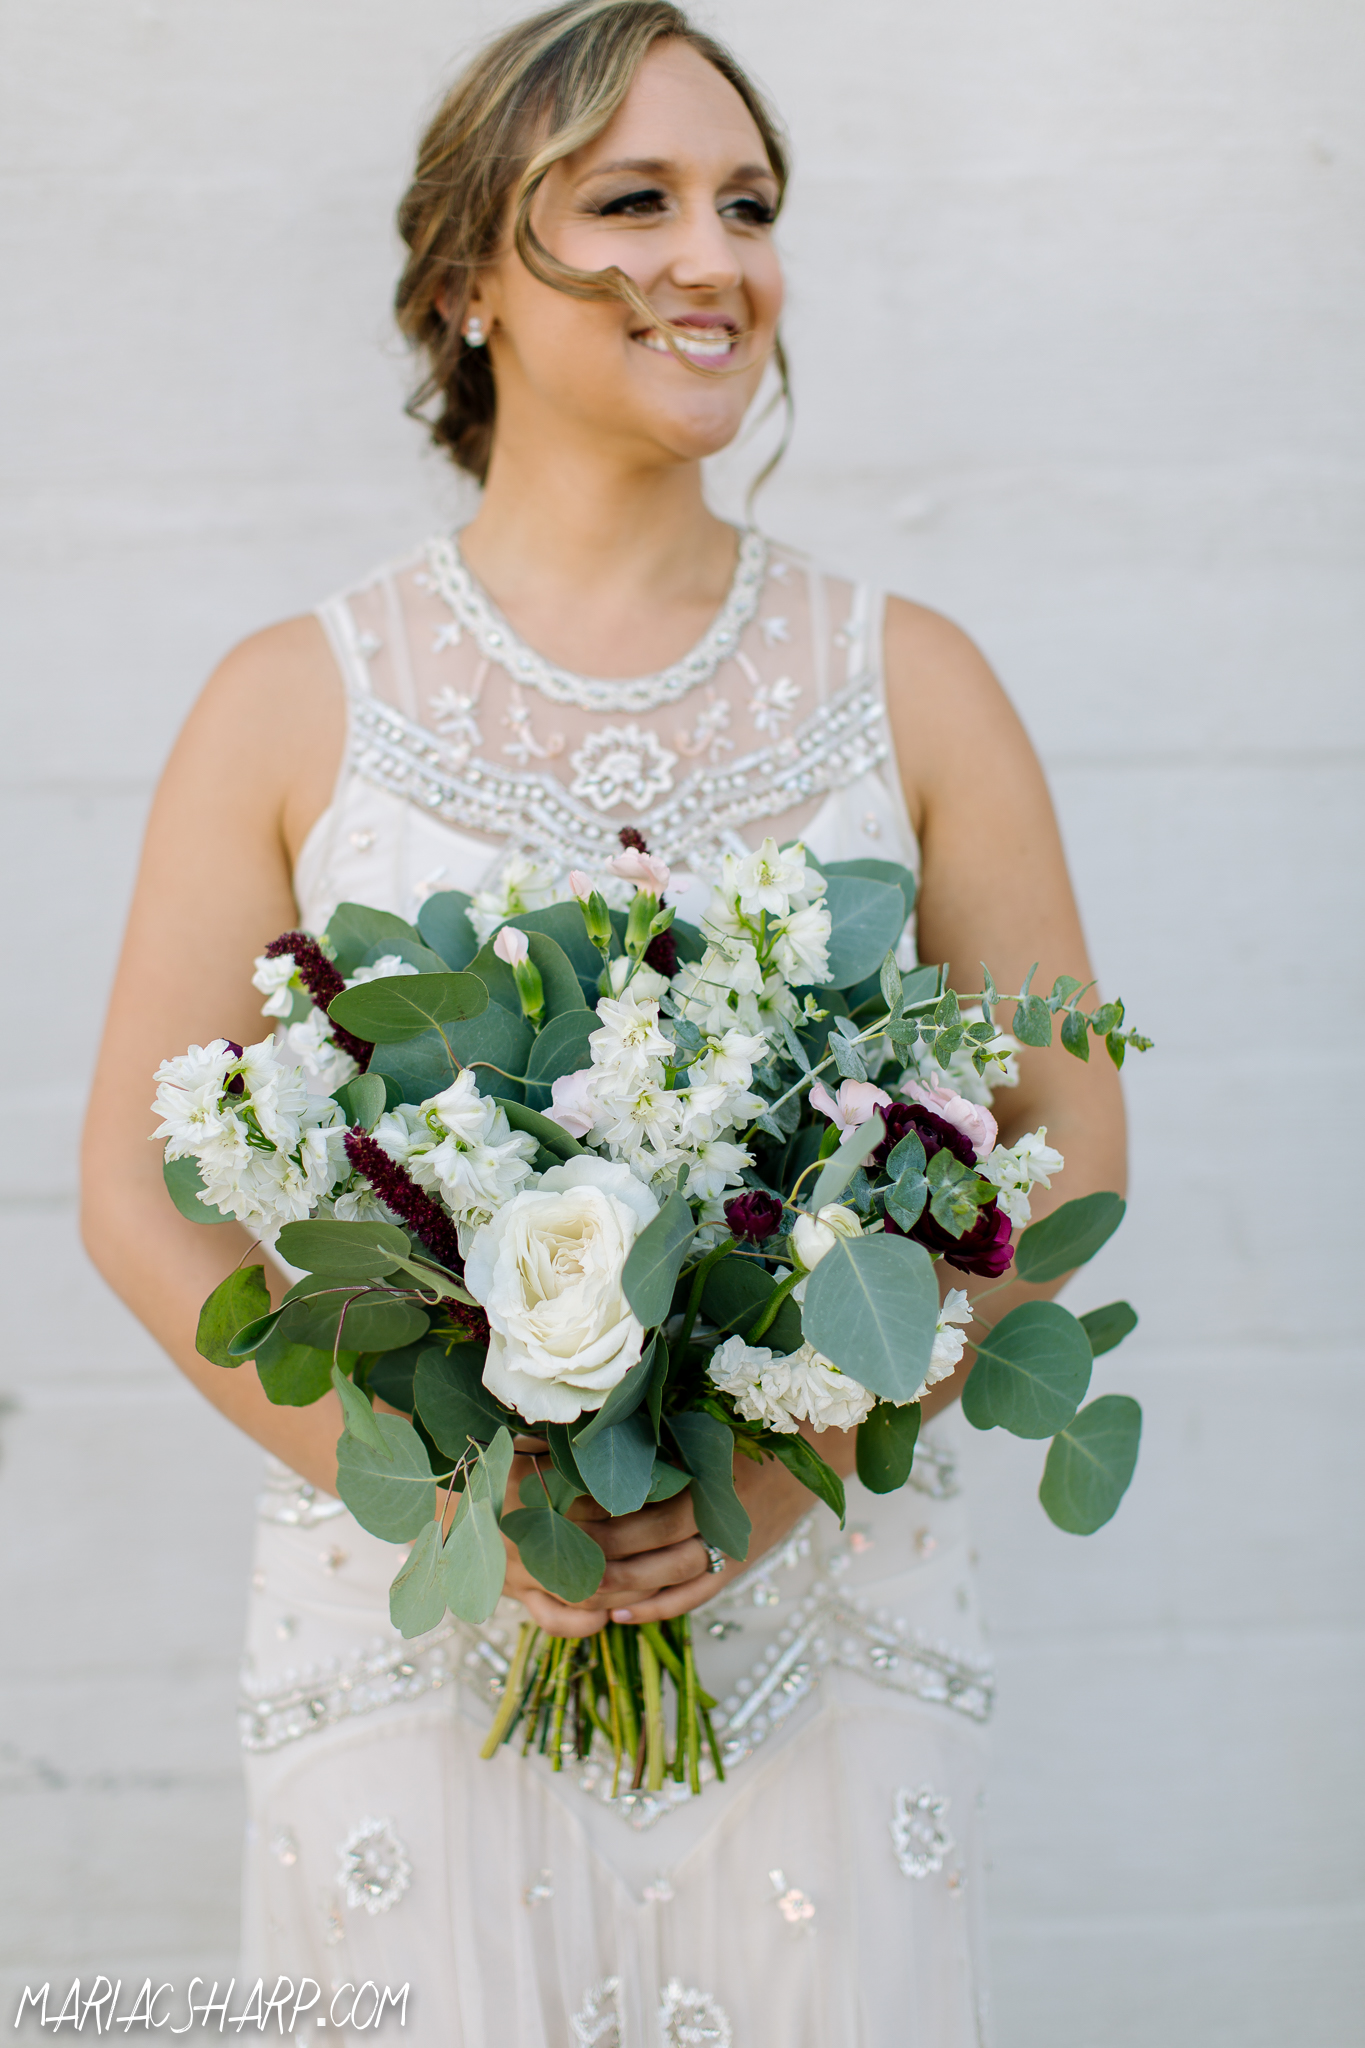 Cassie-Larson-Matt-Seccombe-wedding-20170715-179.jpg